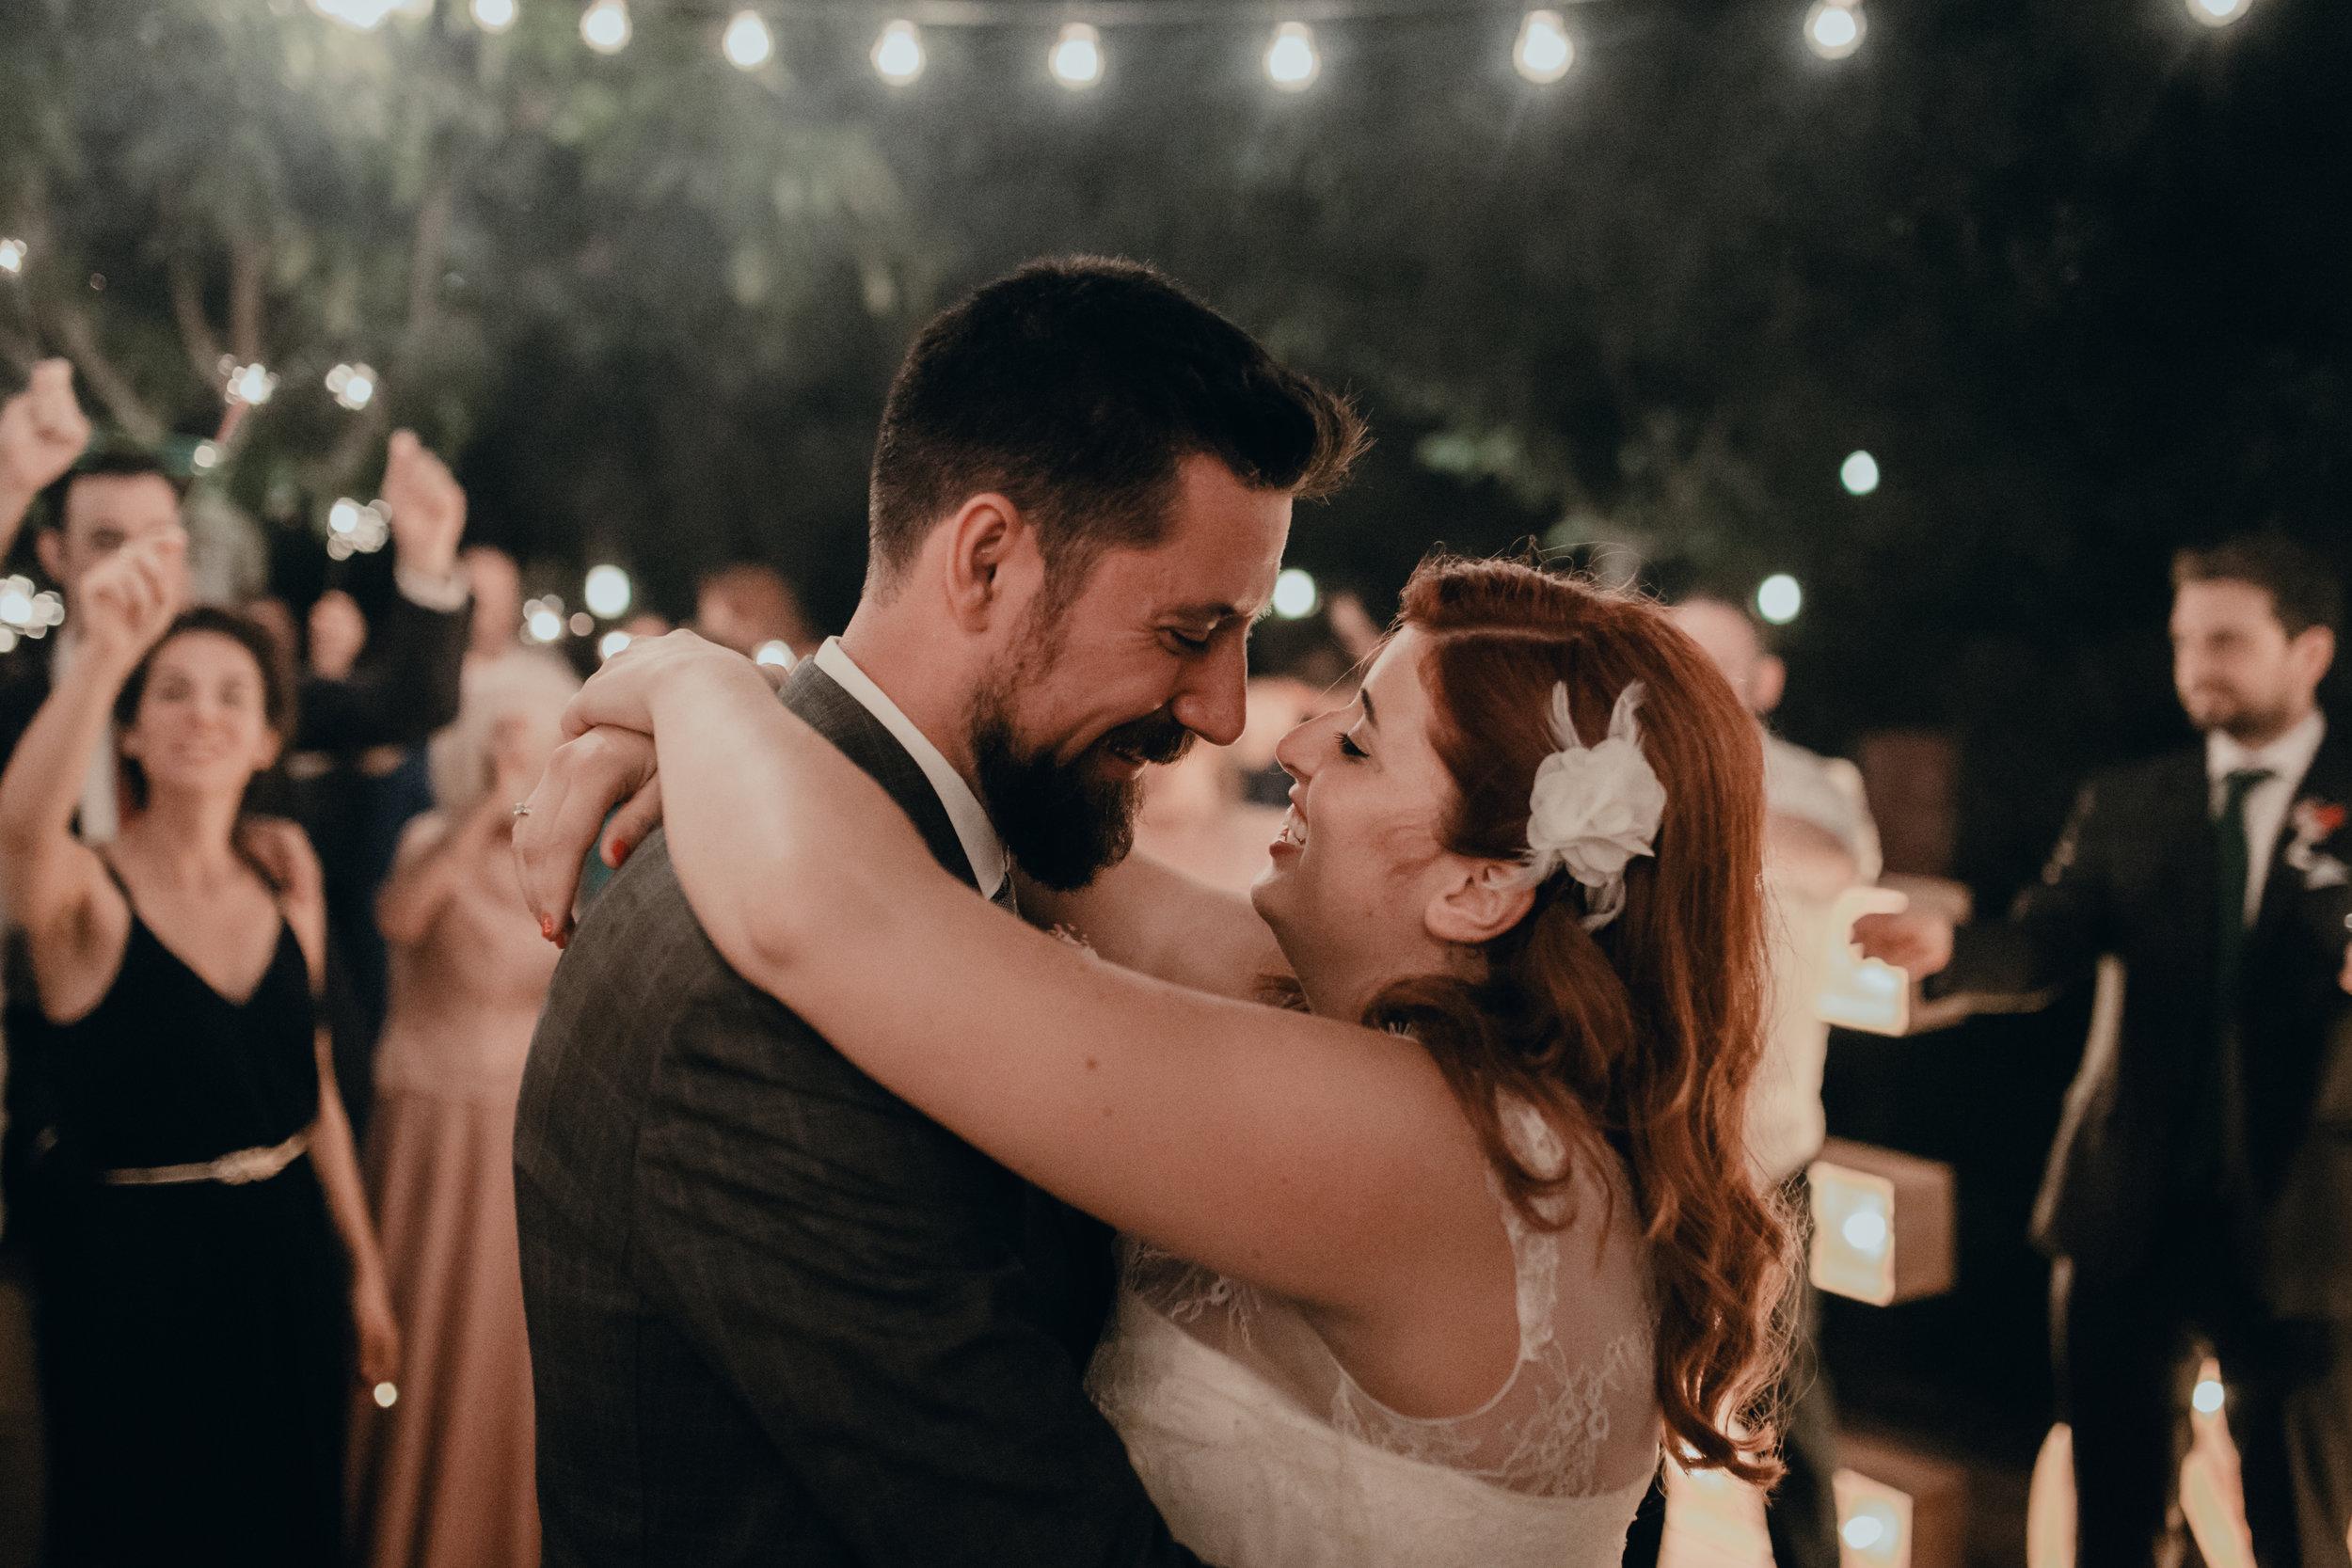 thenortherngirlphotography_photography_thenortherngirl_rebeccascabros_wedding_weddingphotography_masialagarrigadecastelladral_joaniemma_bodaenbarcelona_weddingphotographer_emmaijoan-1072.jpg